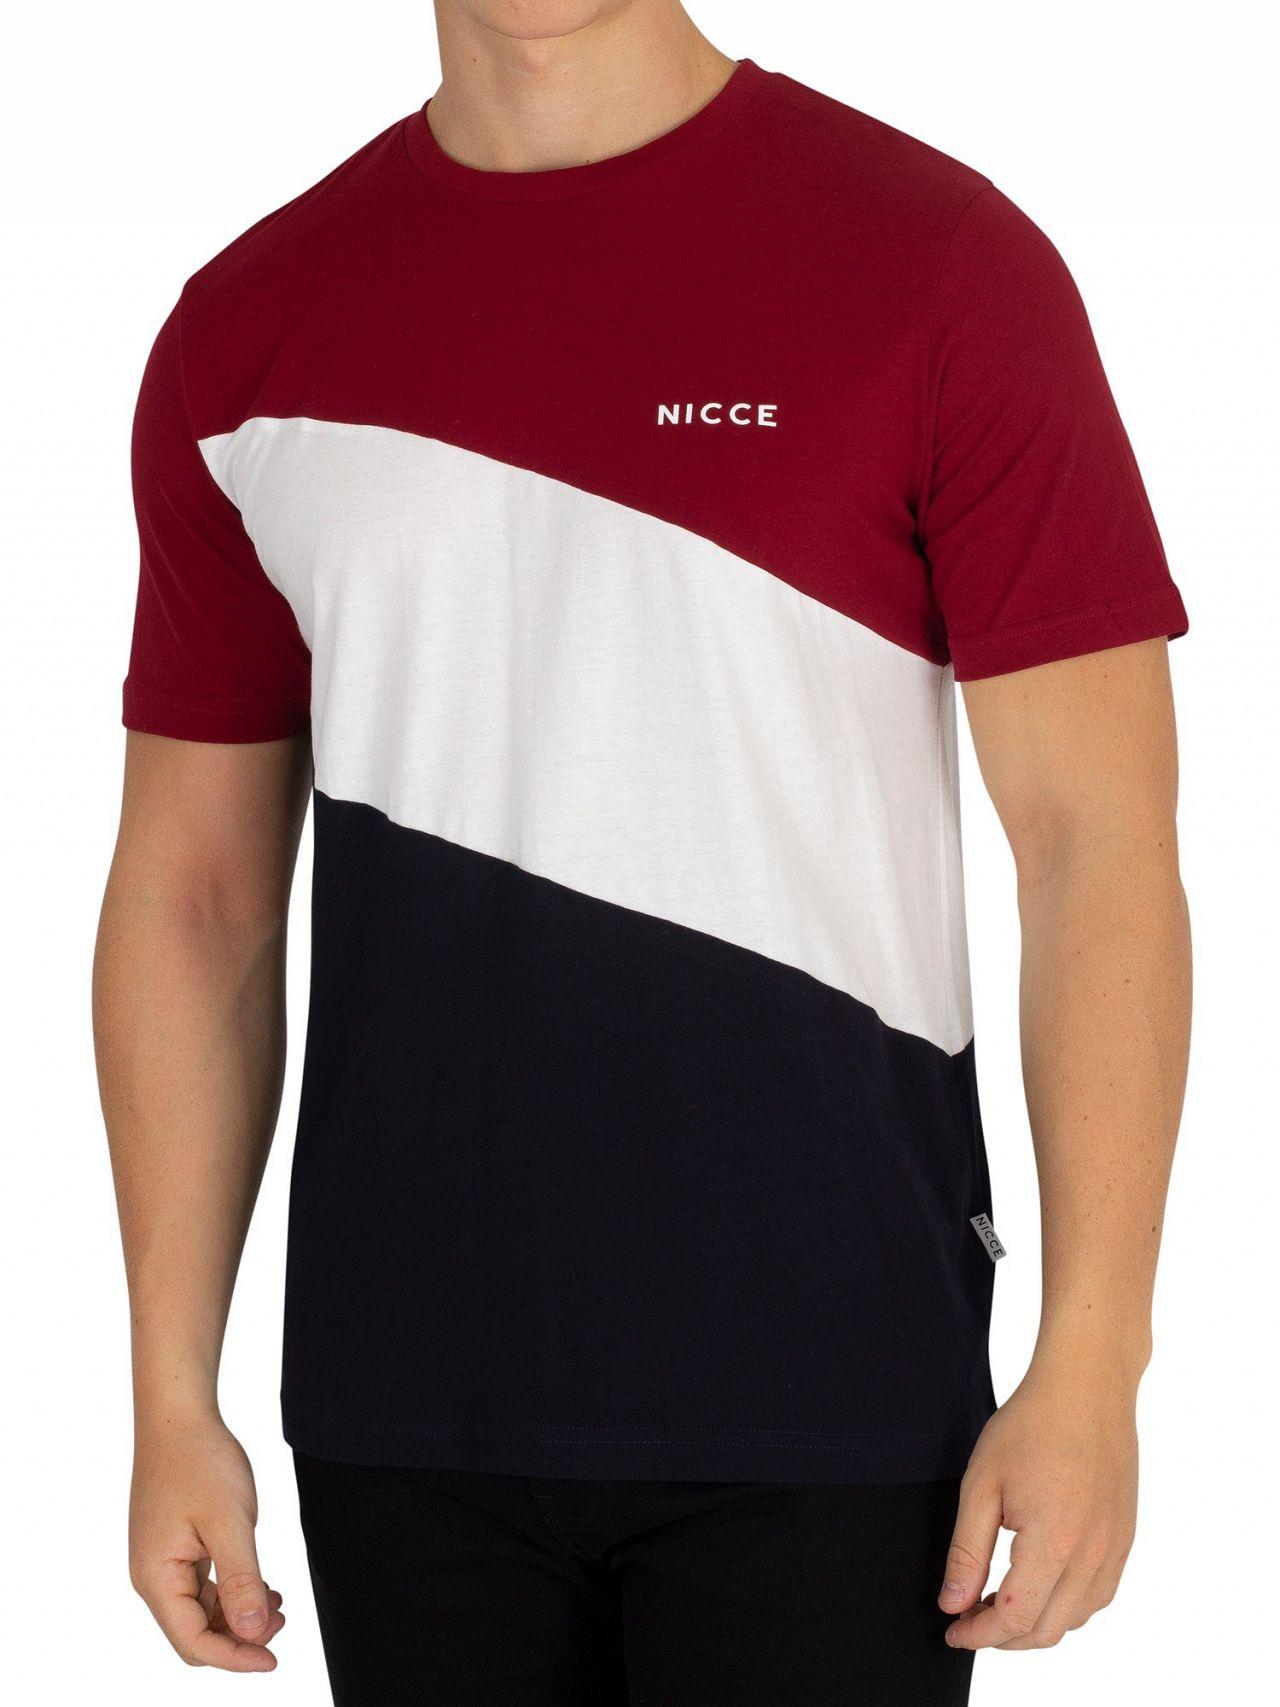 46cfed67b8 Nicce London Merlot/White/Deep Navy Triad T-Shirt   Standout